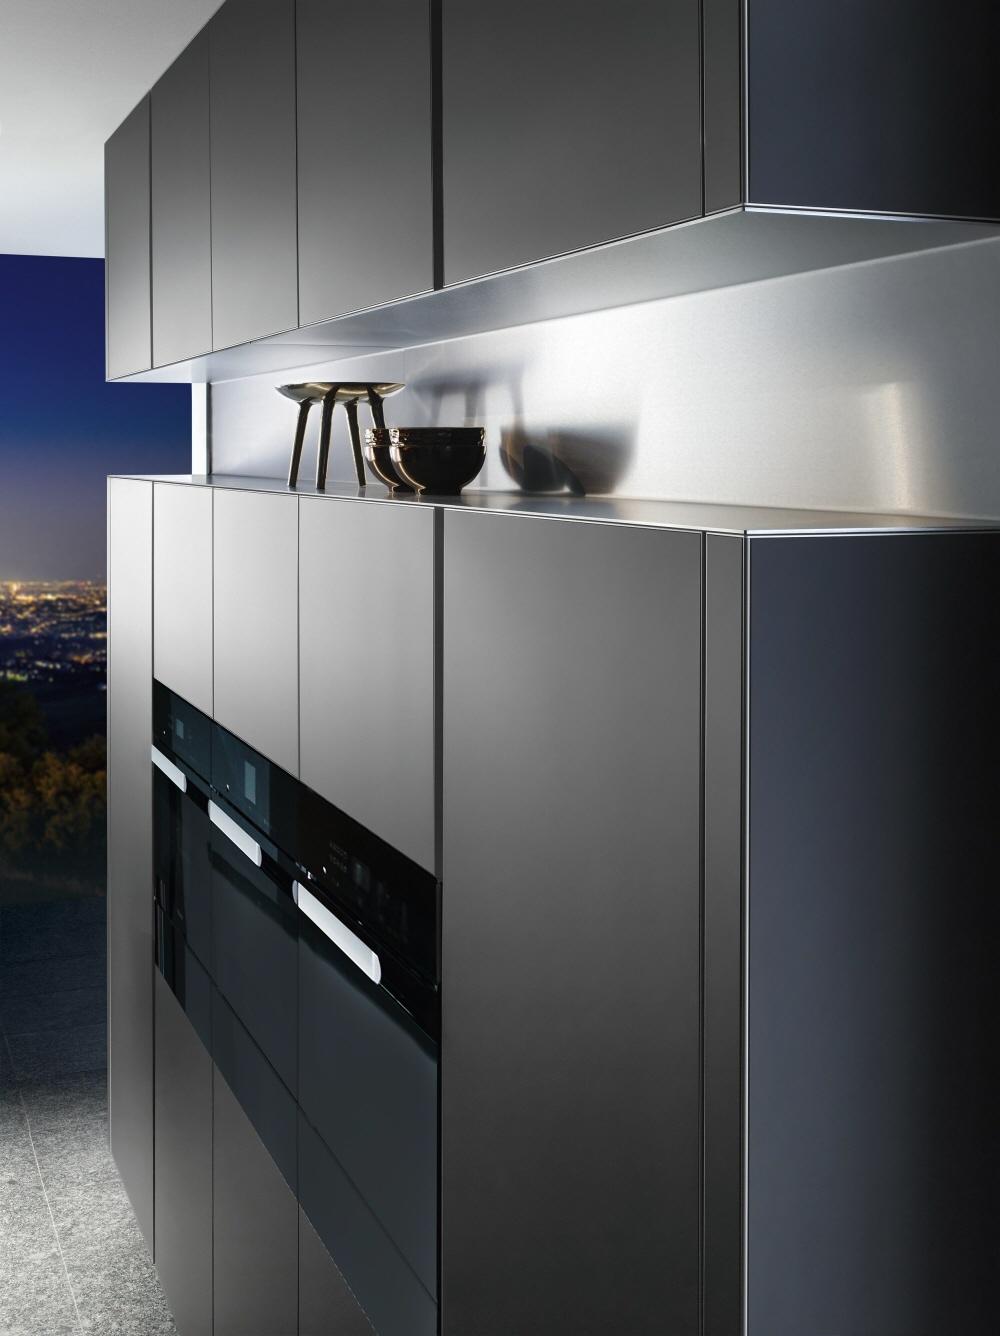 intuo bido glasfronten kombiniert mit holzfront wild oak. Black Bedroom Furniture Sets. Home Design Ideas